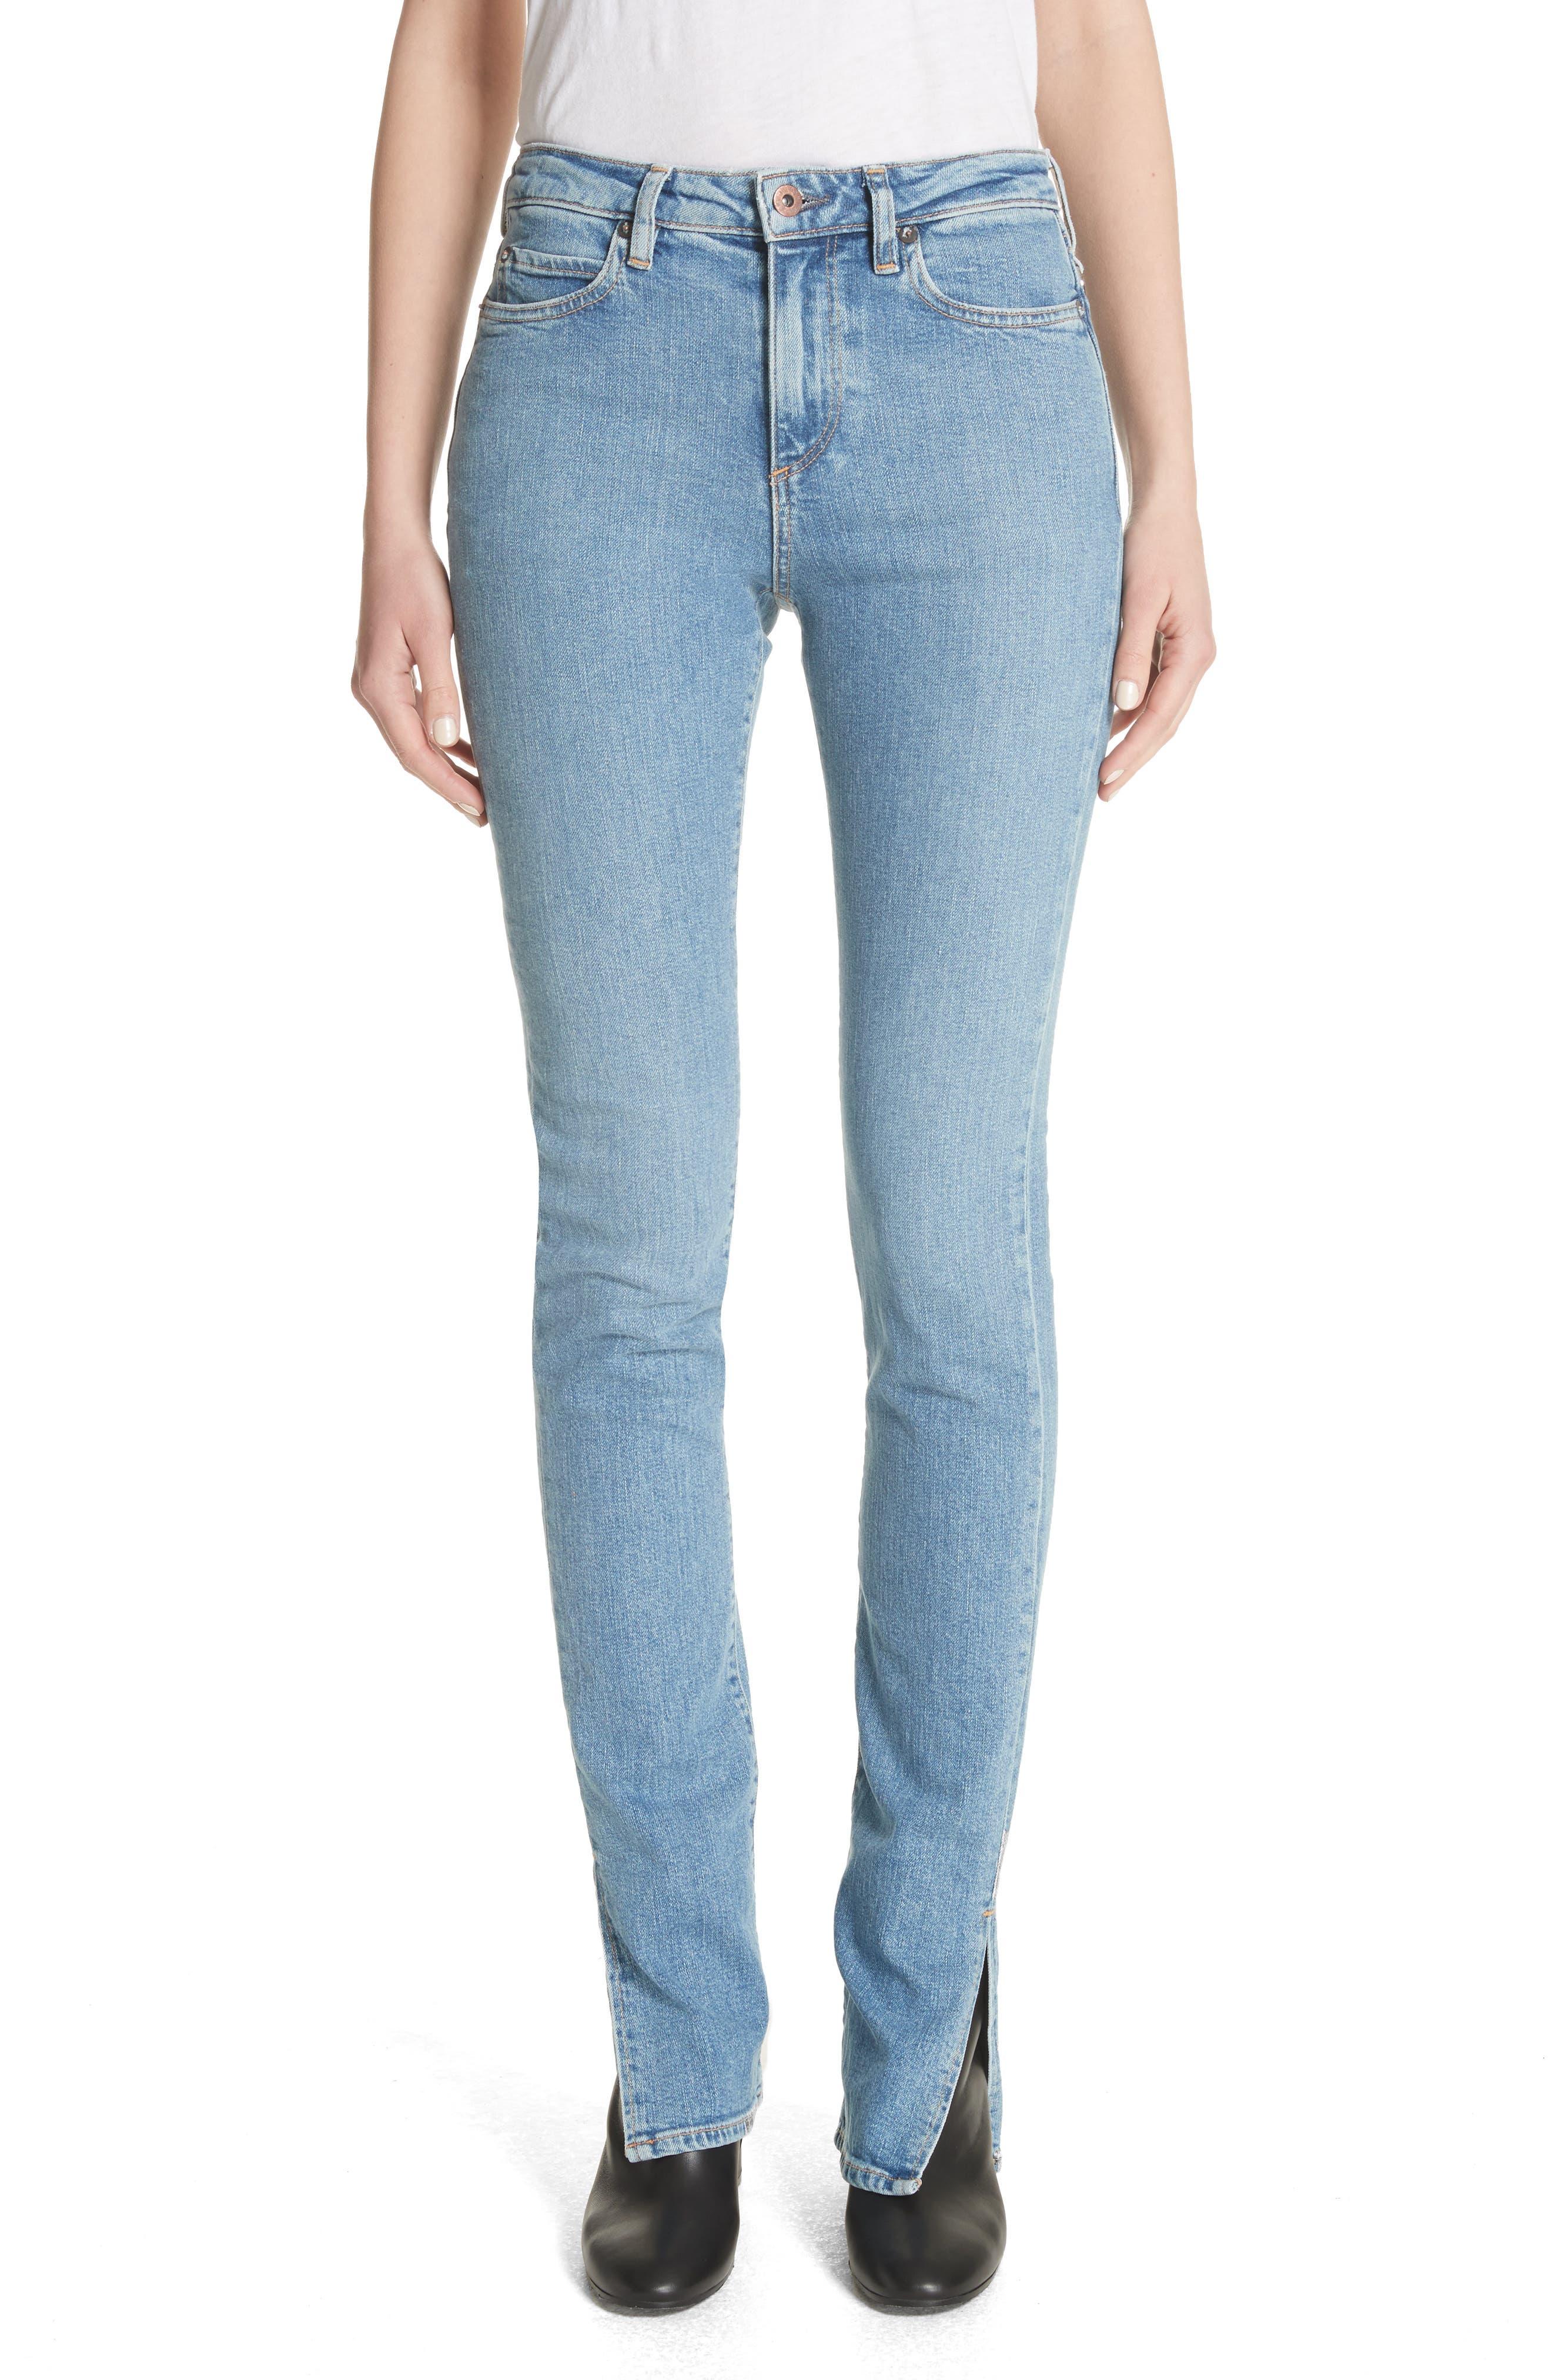 Lowry Split Hem Jeans,                             Main thumbnail 1, color,                             400